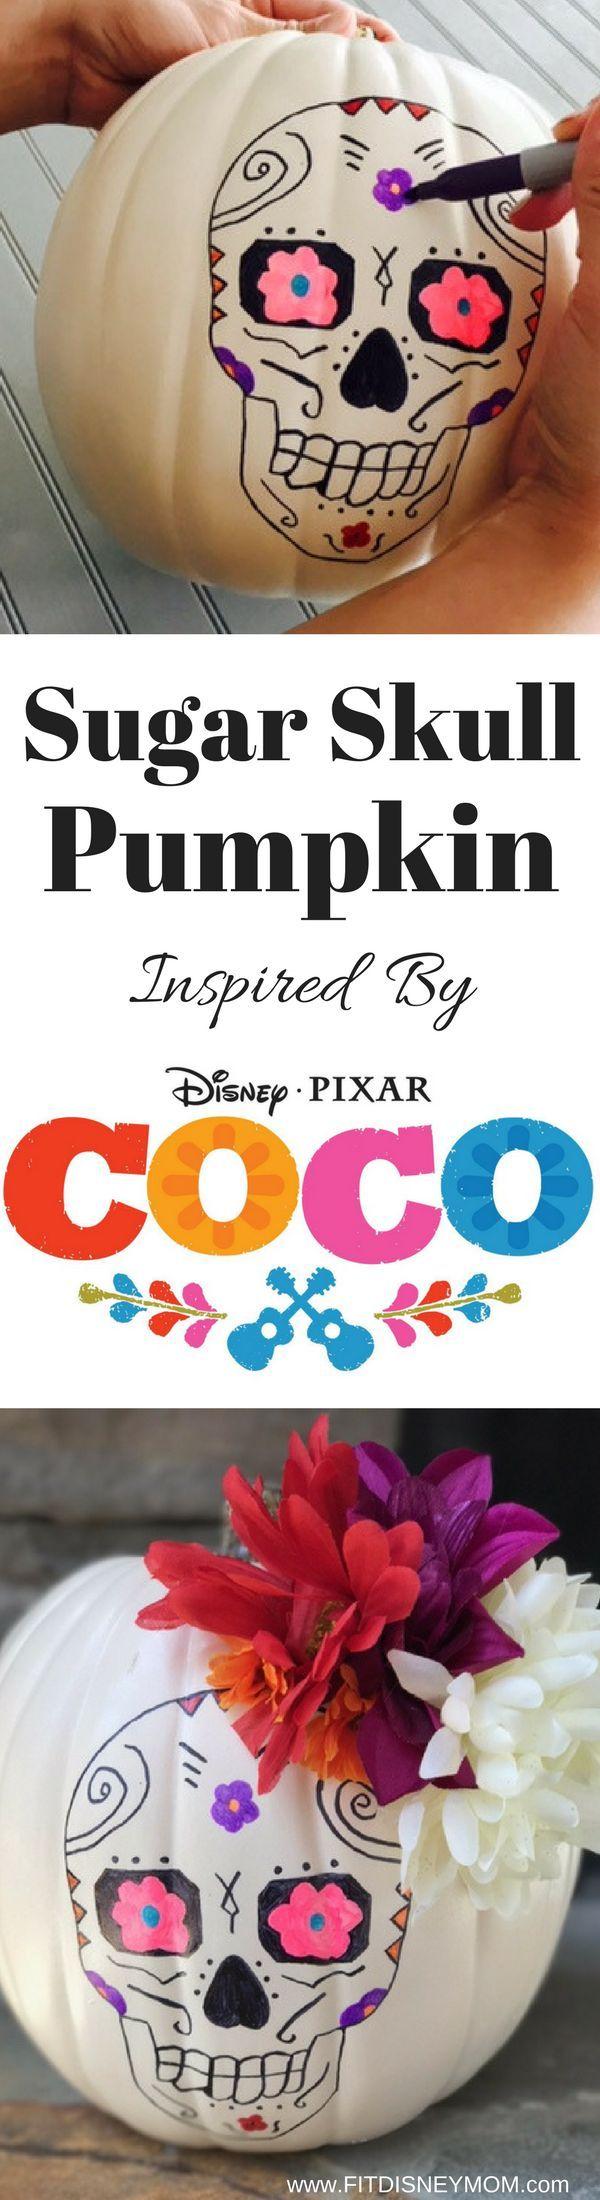 Diy Sugar Skull Pumpkin Inspired By Disney Pixar S Coco Holidays